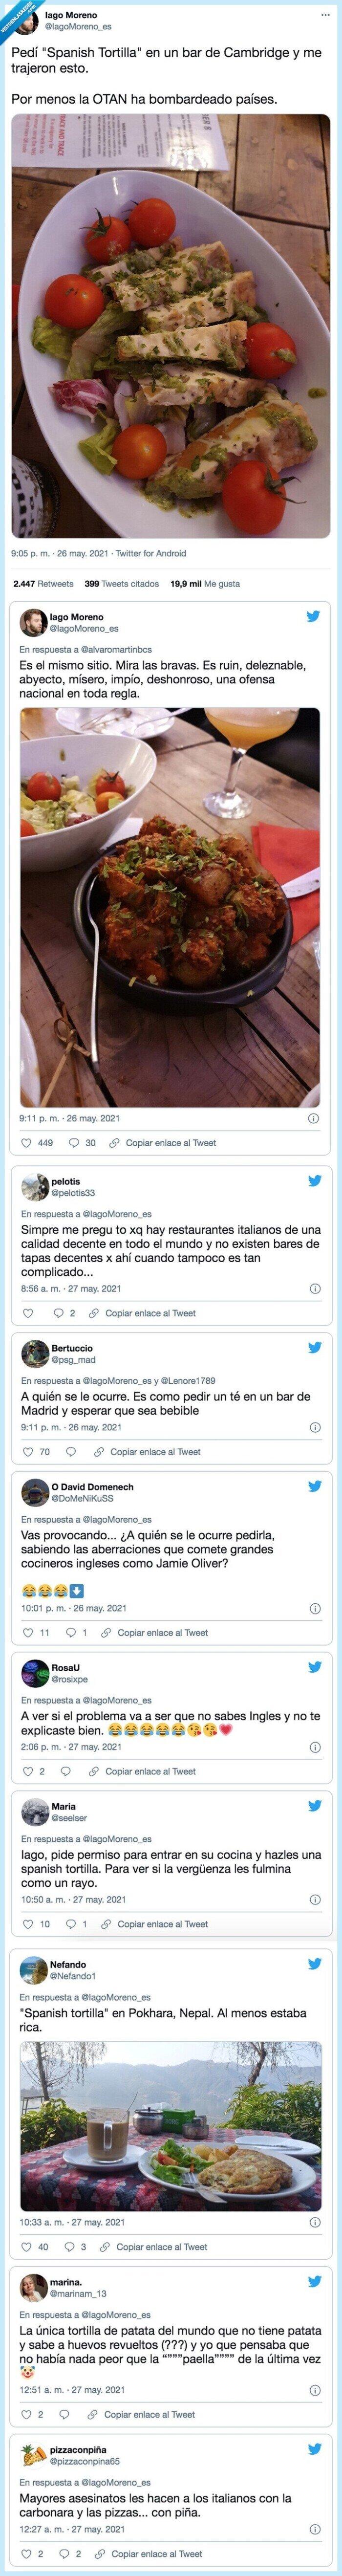 @alvaromartinbcs,deleznable,deshonroso,mísero,nacional,tortilla